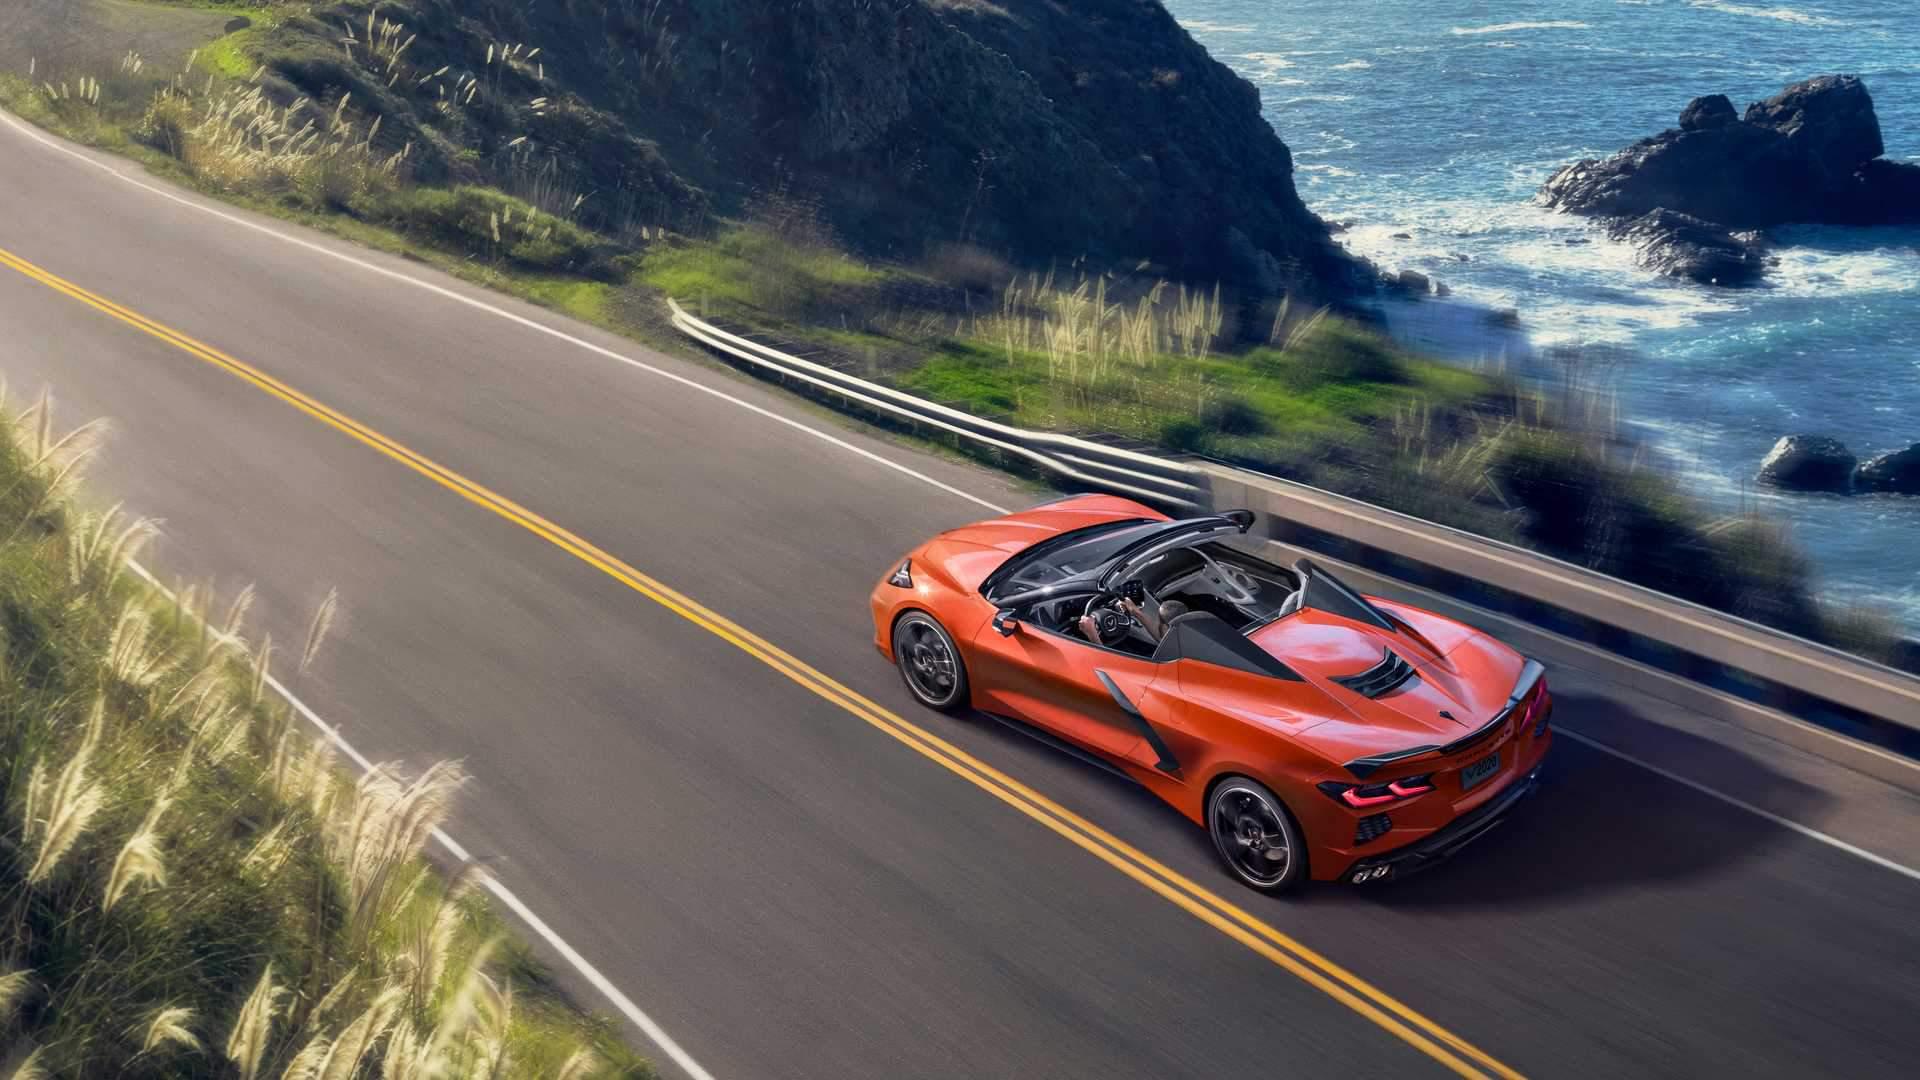 2020-chevrolet-corvette-convertible